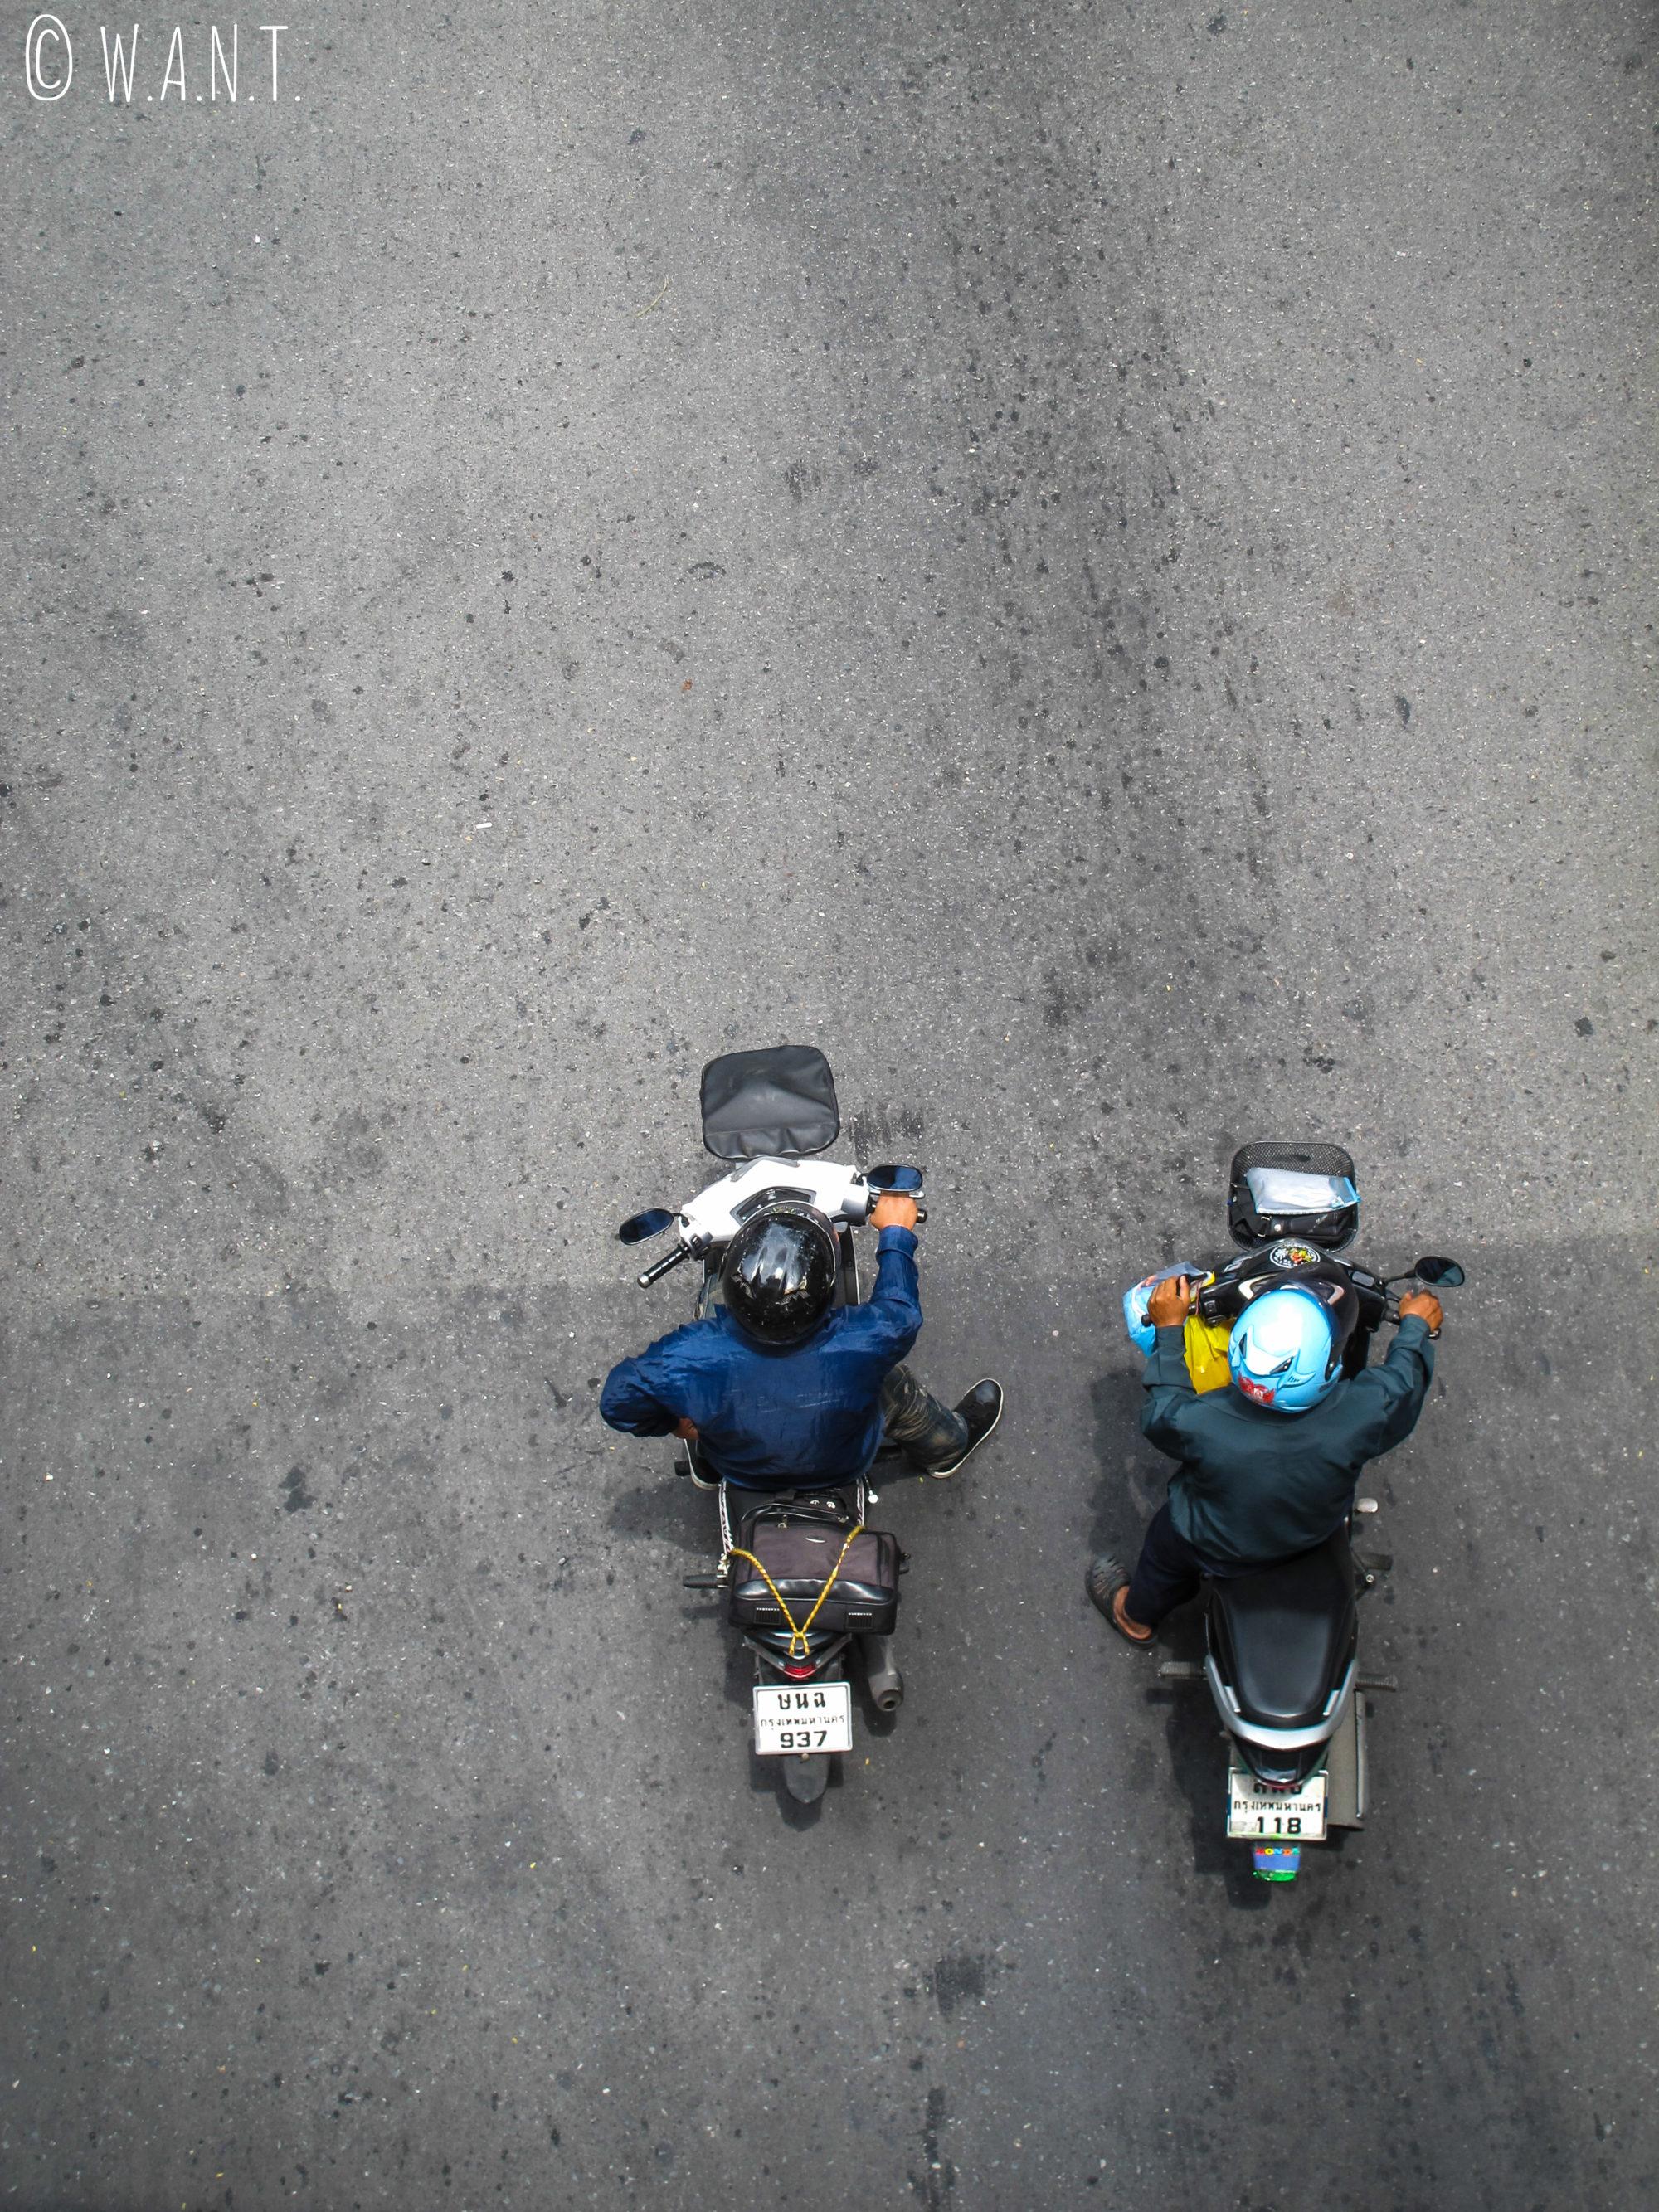 Vue en plongée sur des motos dans les rues de Bangkok